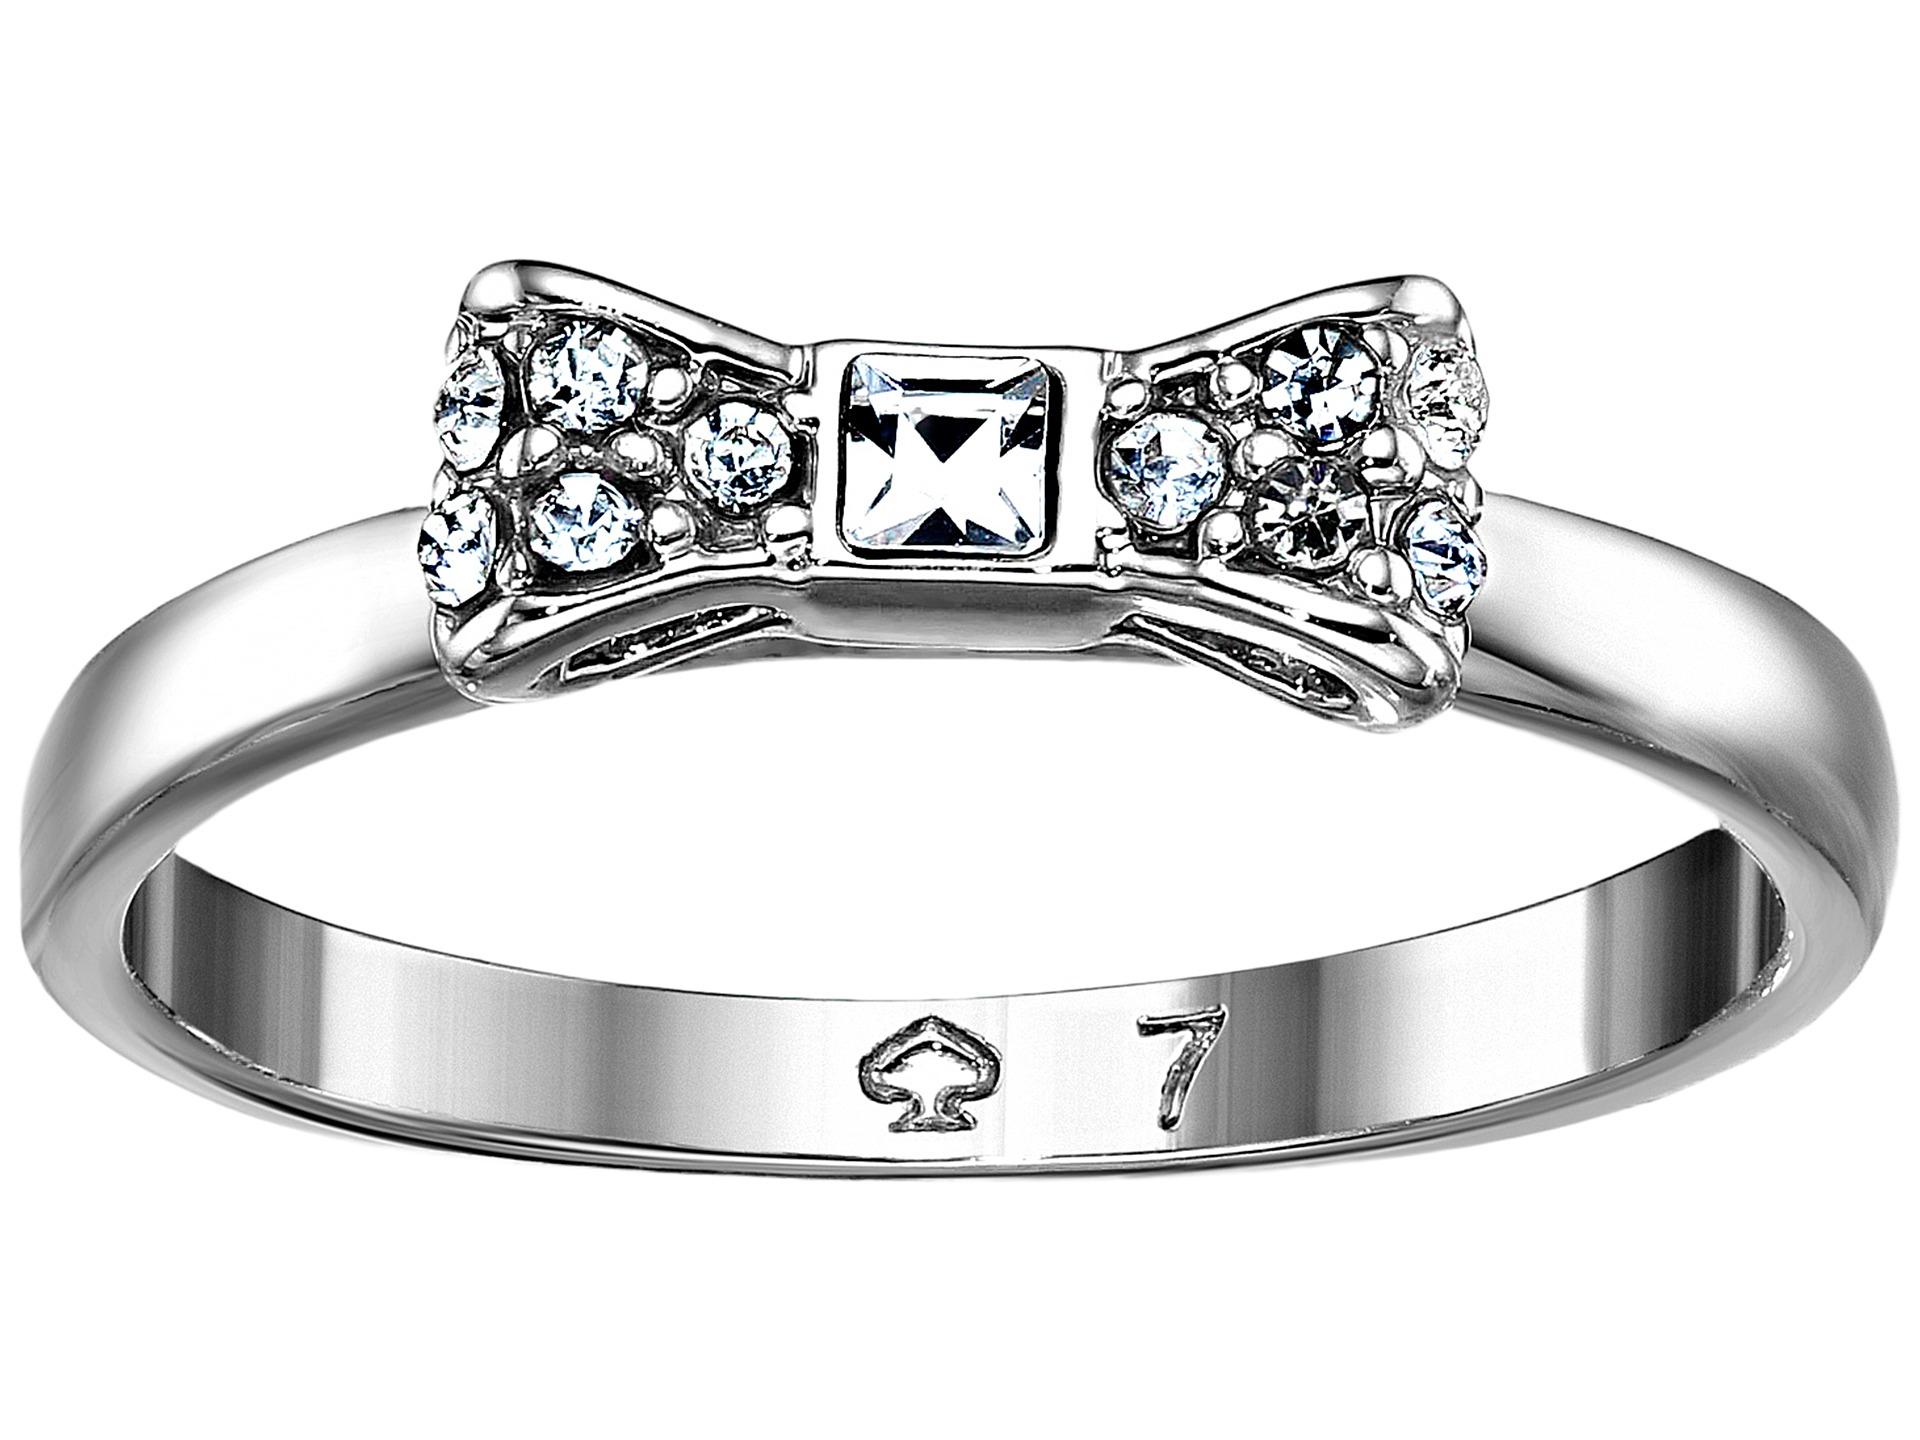 Kate spade new york Ready Set Bow Ring in Metallic